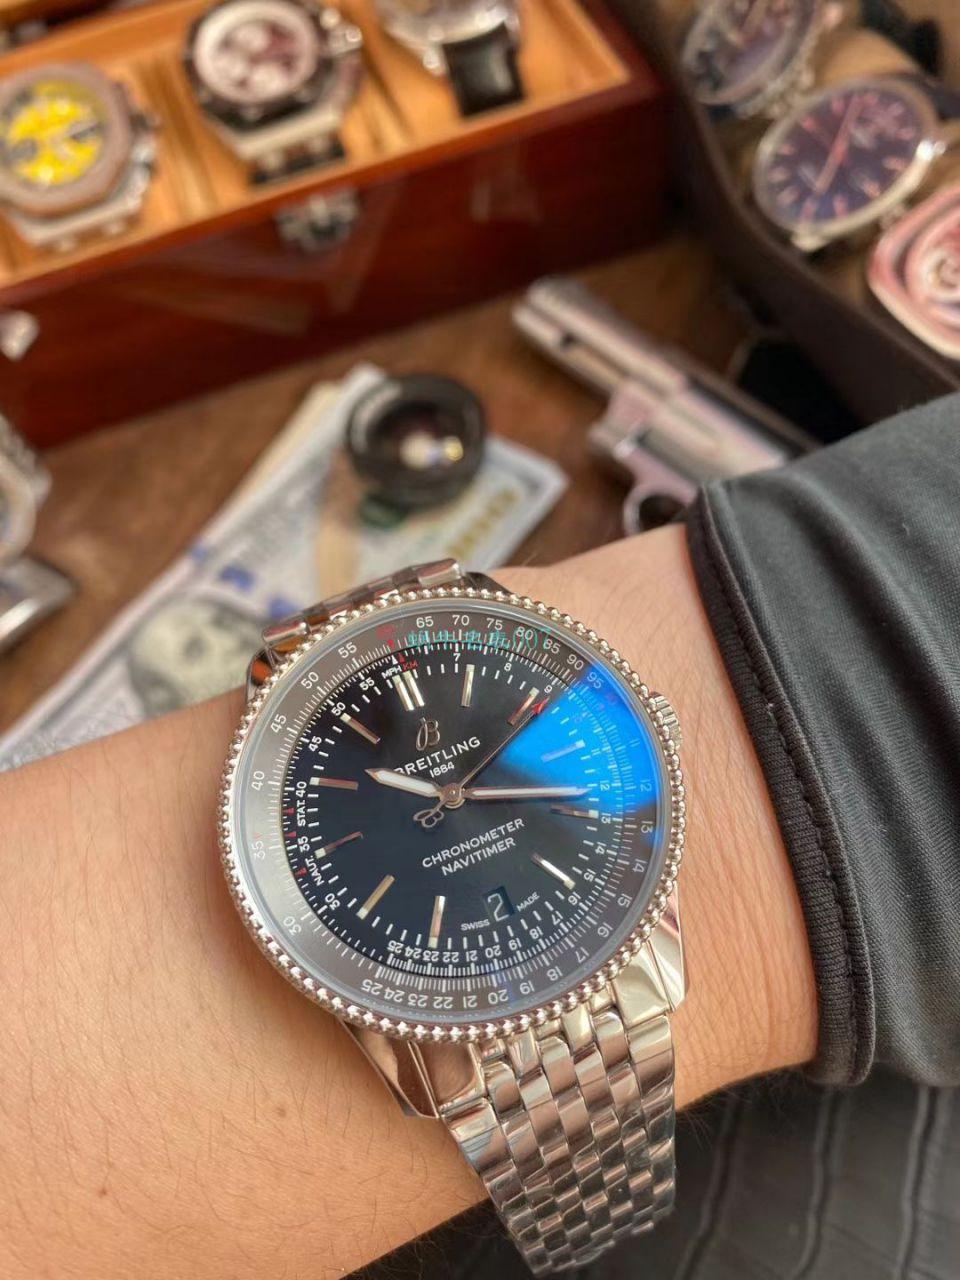 V7厂顶级复刻手表百年灵航空计时1系列A17326211B1A1腕表 / BL185